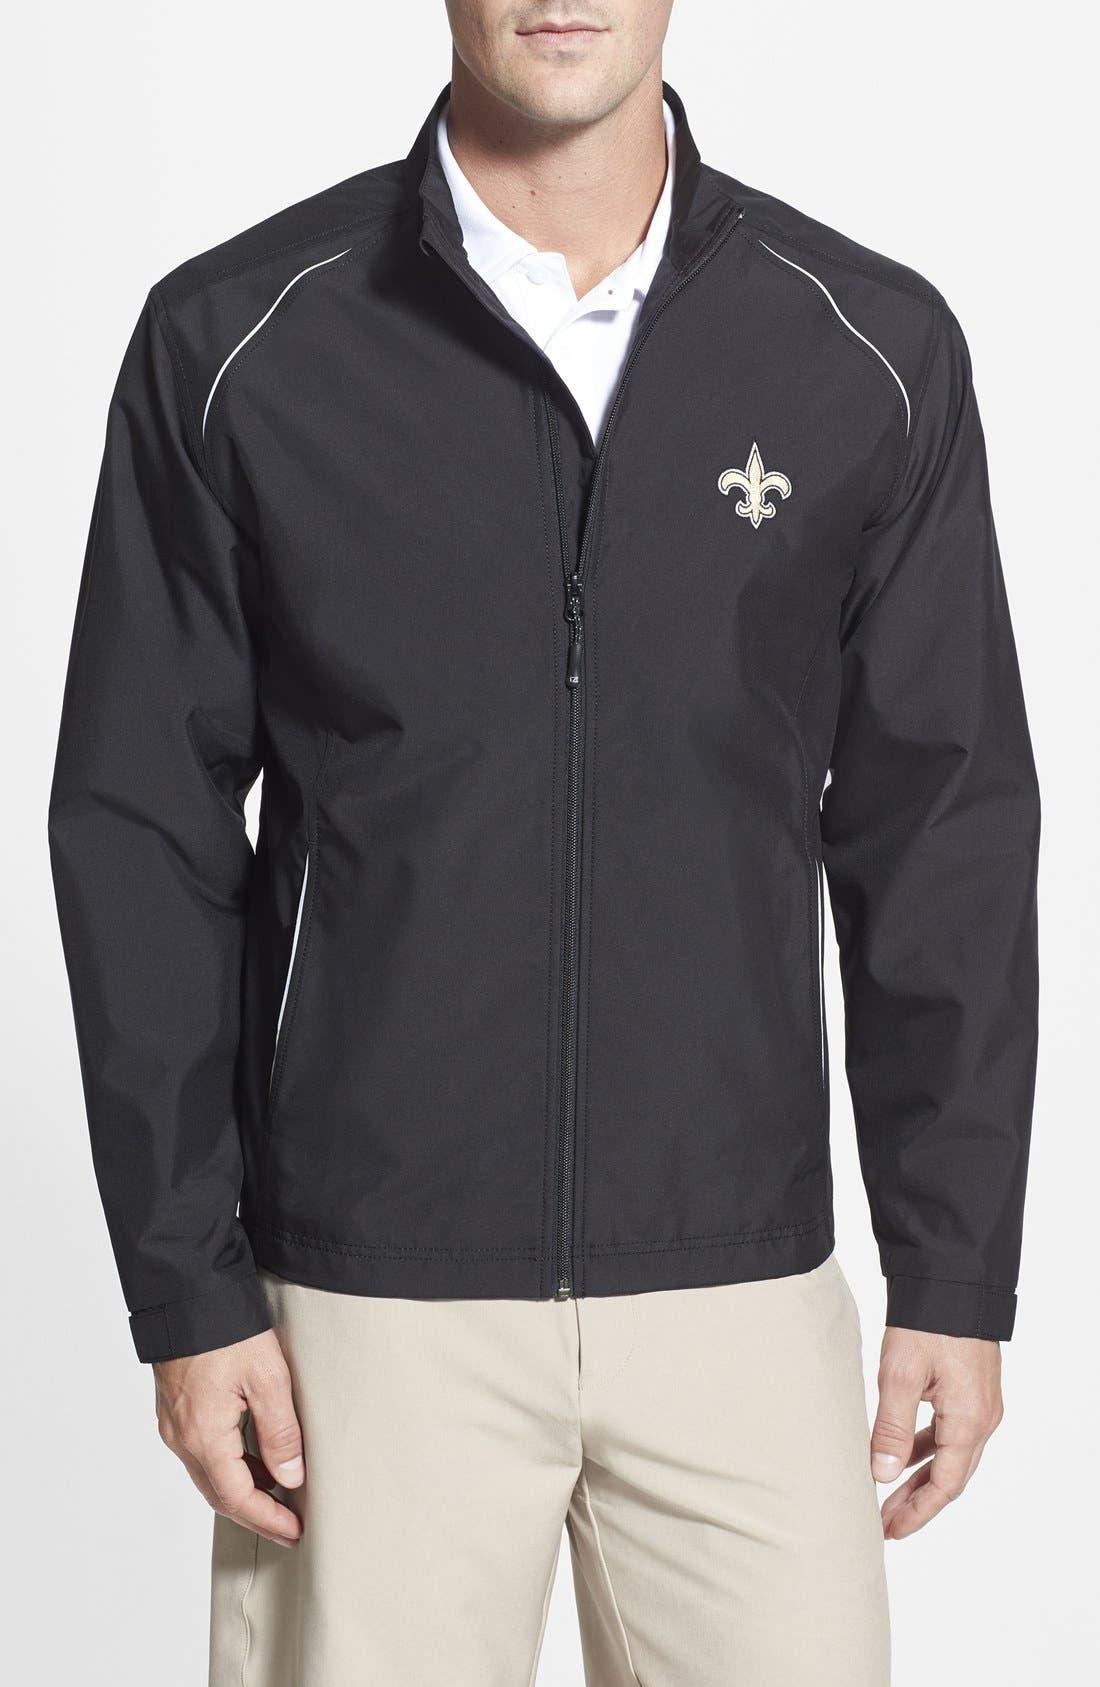 New Orleans Saints - Beacon WeatherTec Wind & Water Resistant Jacket,                             Main thumbnail 1, color,                             Black